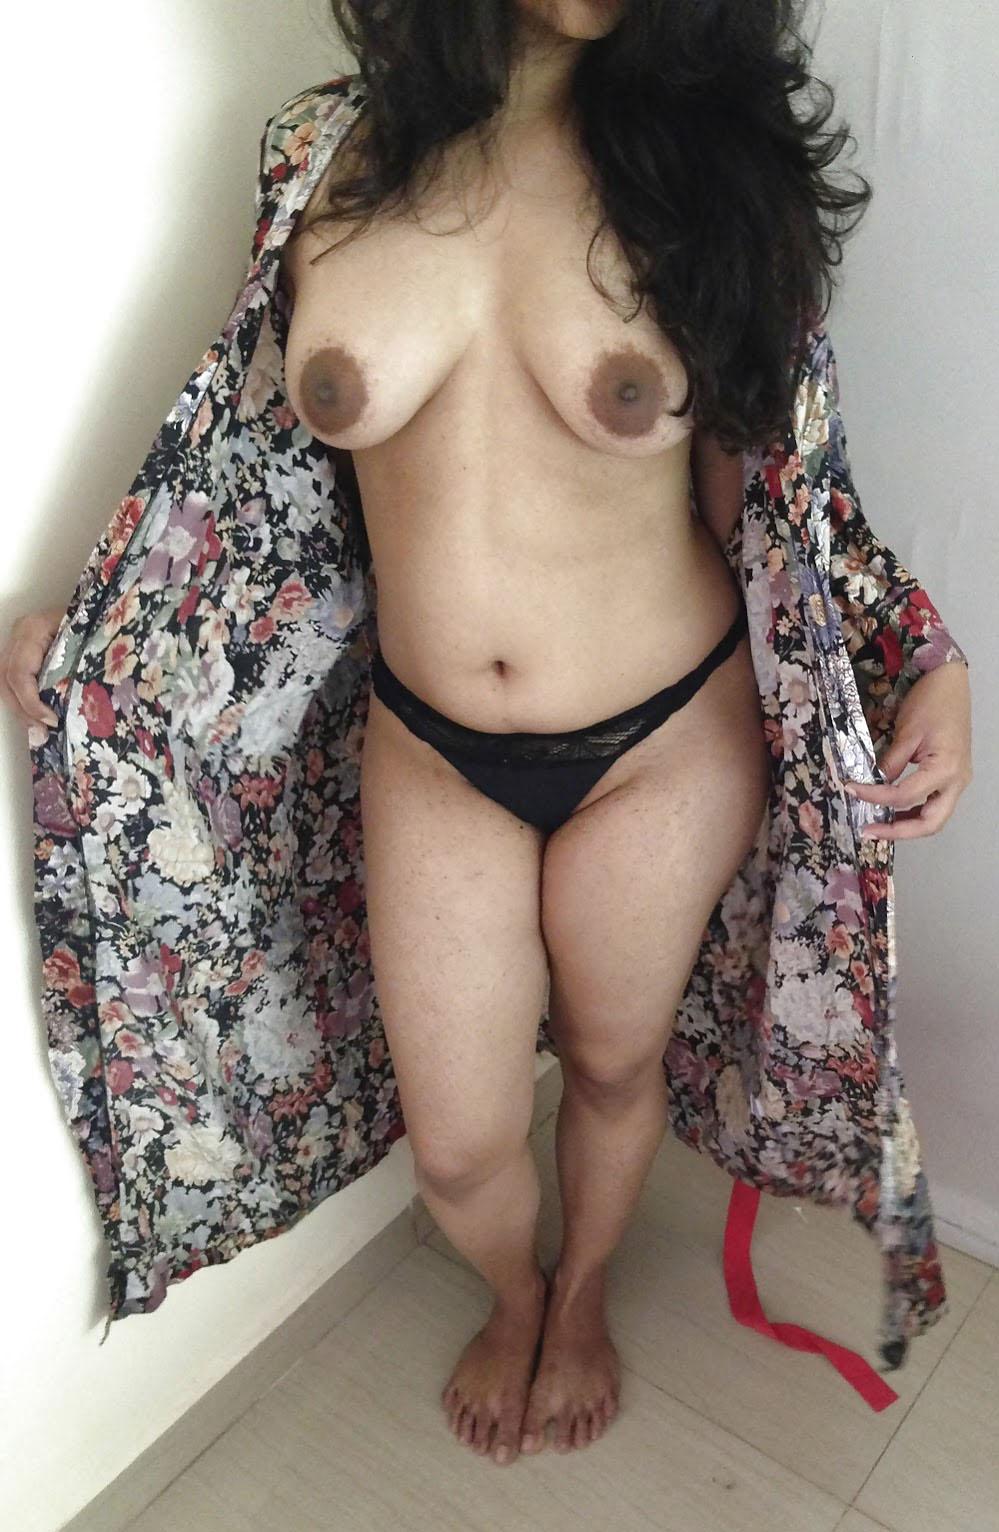 hottest reality tv girls naked